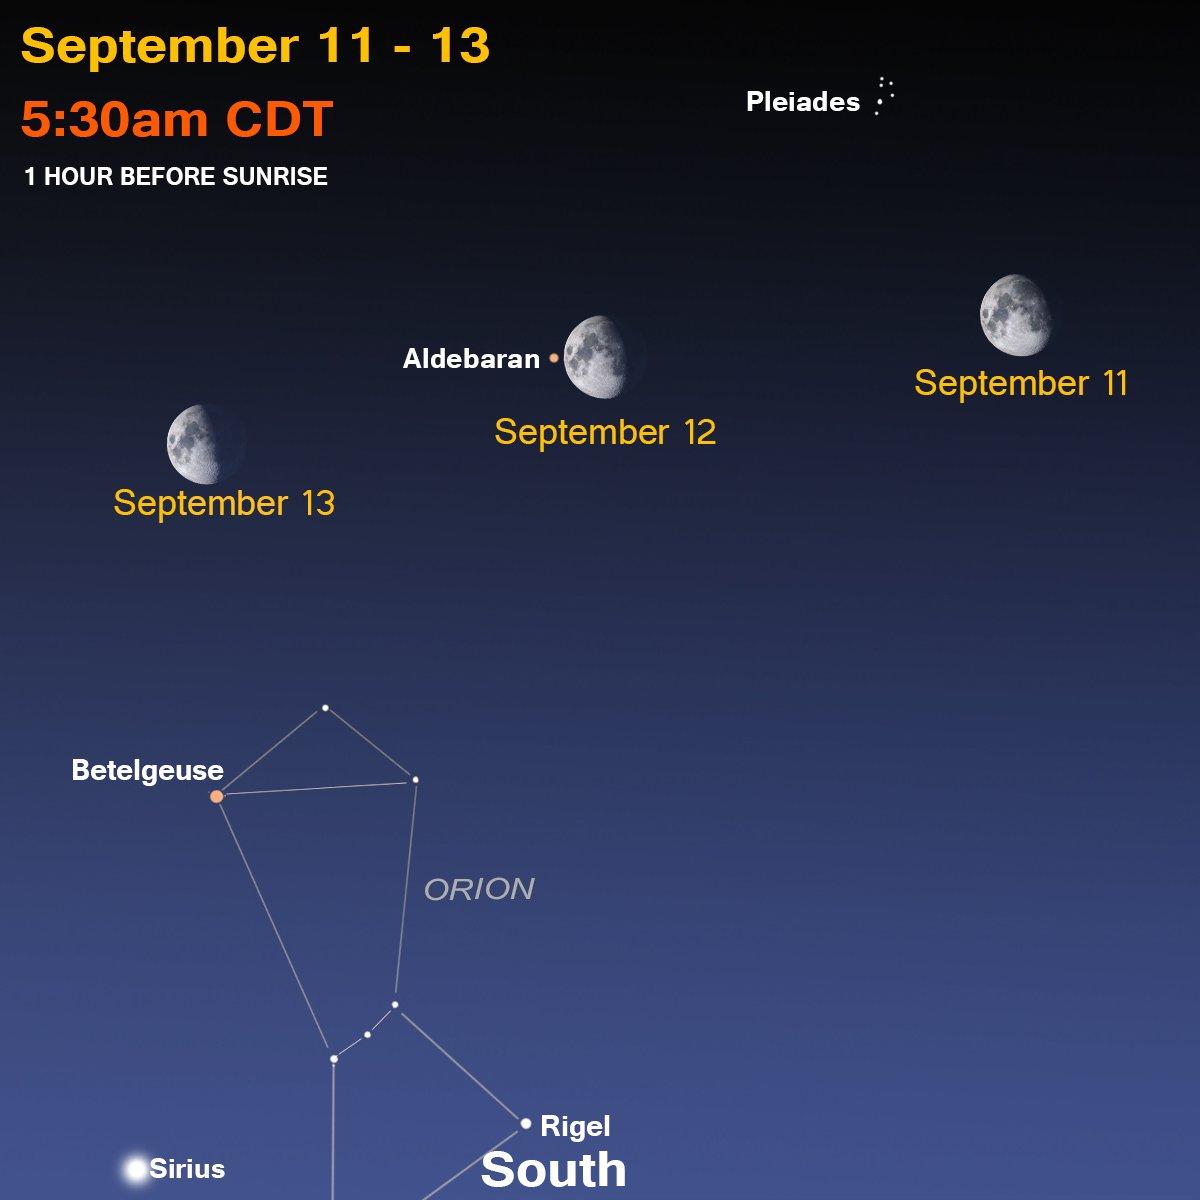 Mpm Planetarium Dept On Twitter Orion Is Back Sirius Too Aka